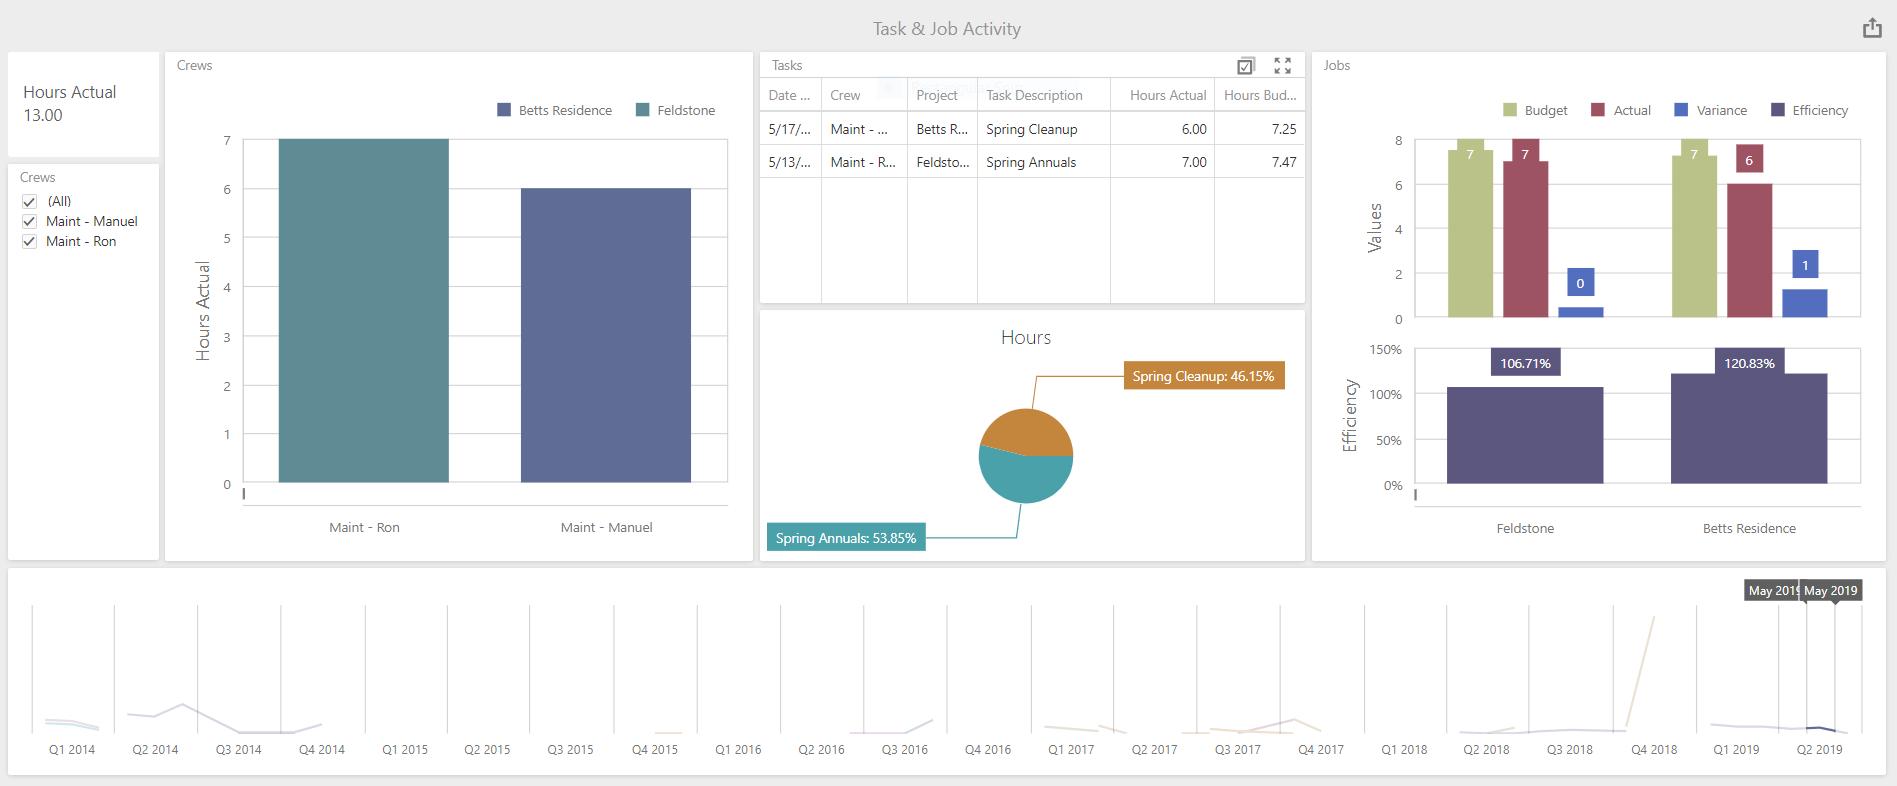 landscape business visual reporting - Task & Job Activity Budget vs Actual